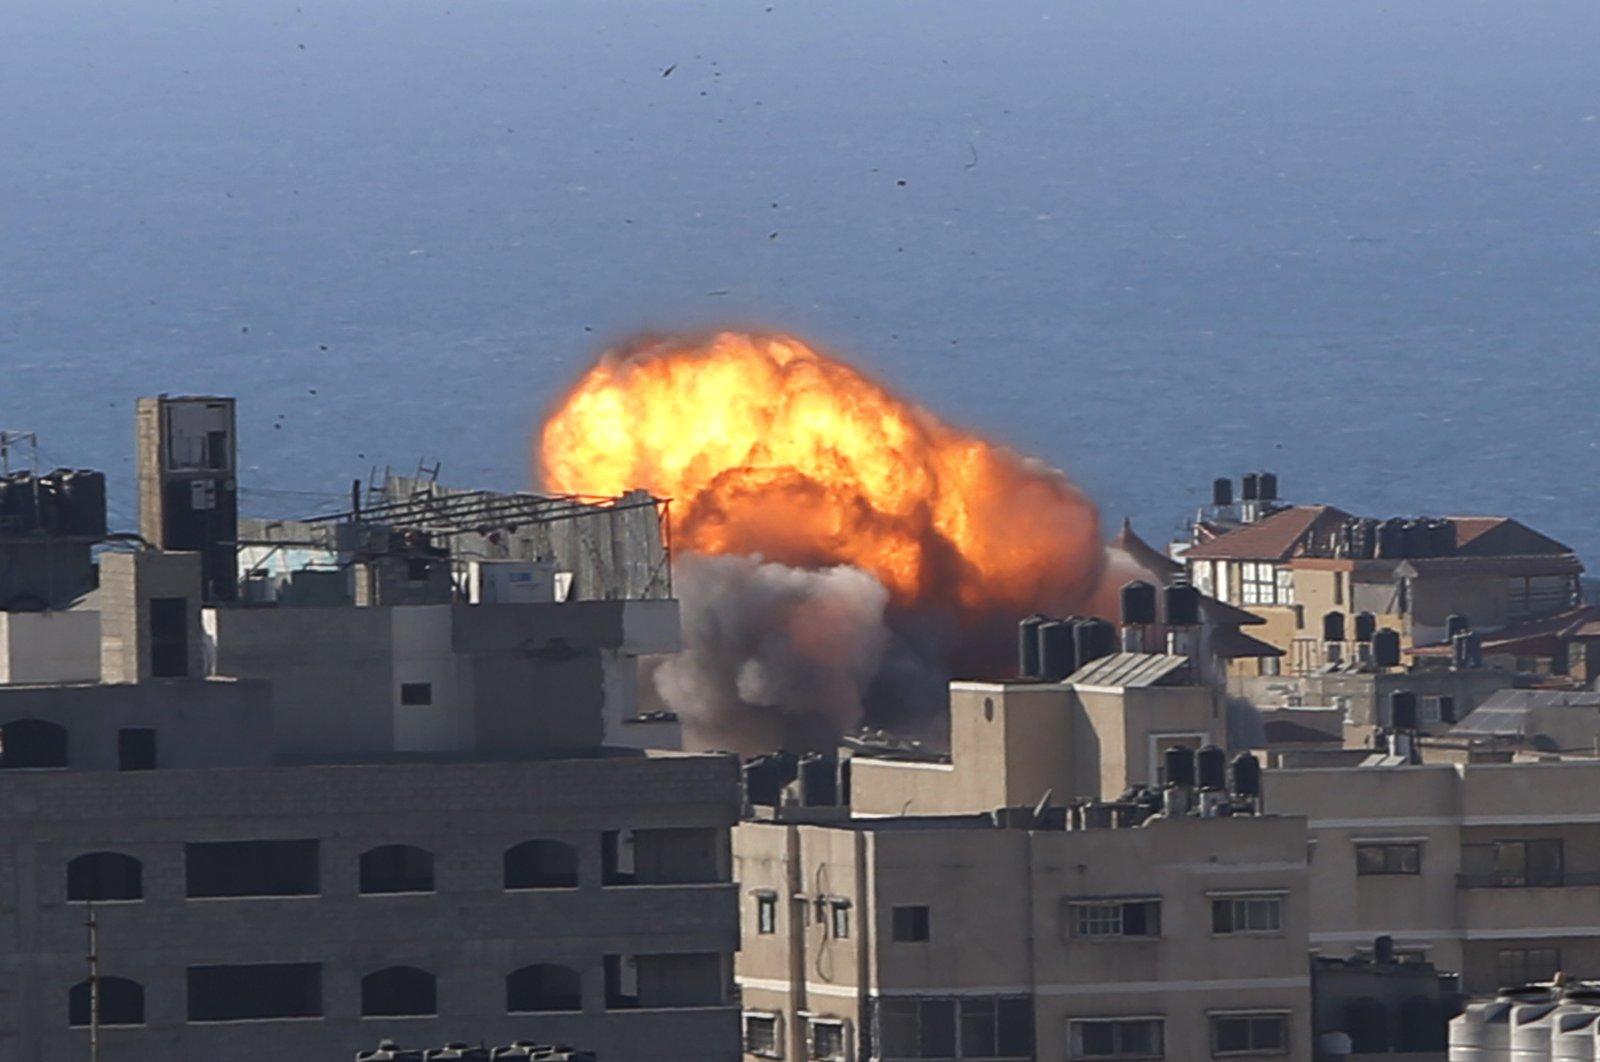 Smoke rises following Israeli airstrikes on a building in Gaza City, Palestine, Friday, May 14, 2021. (AP Photo)